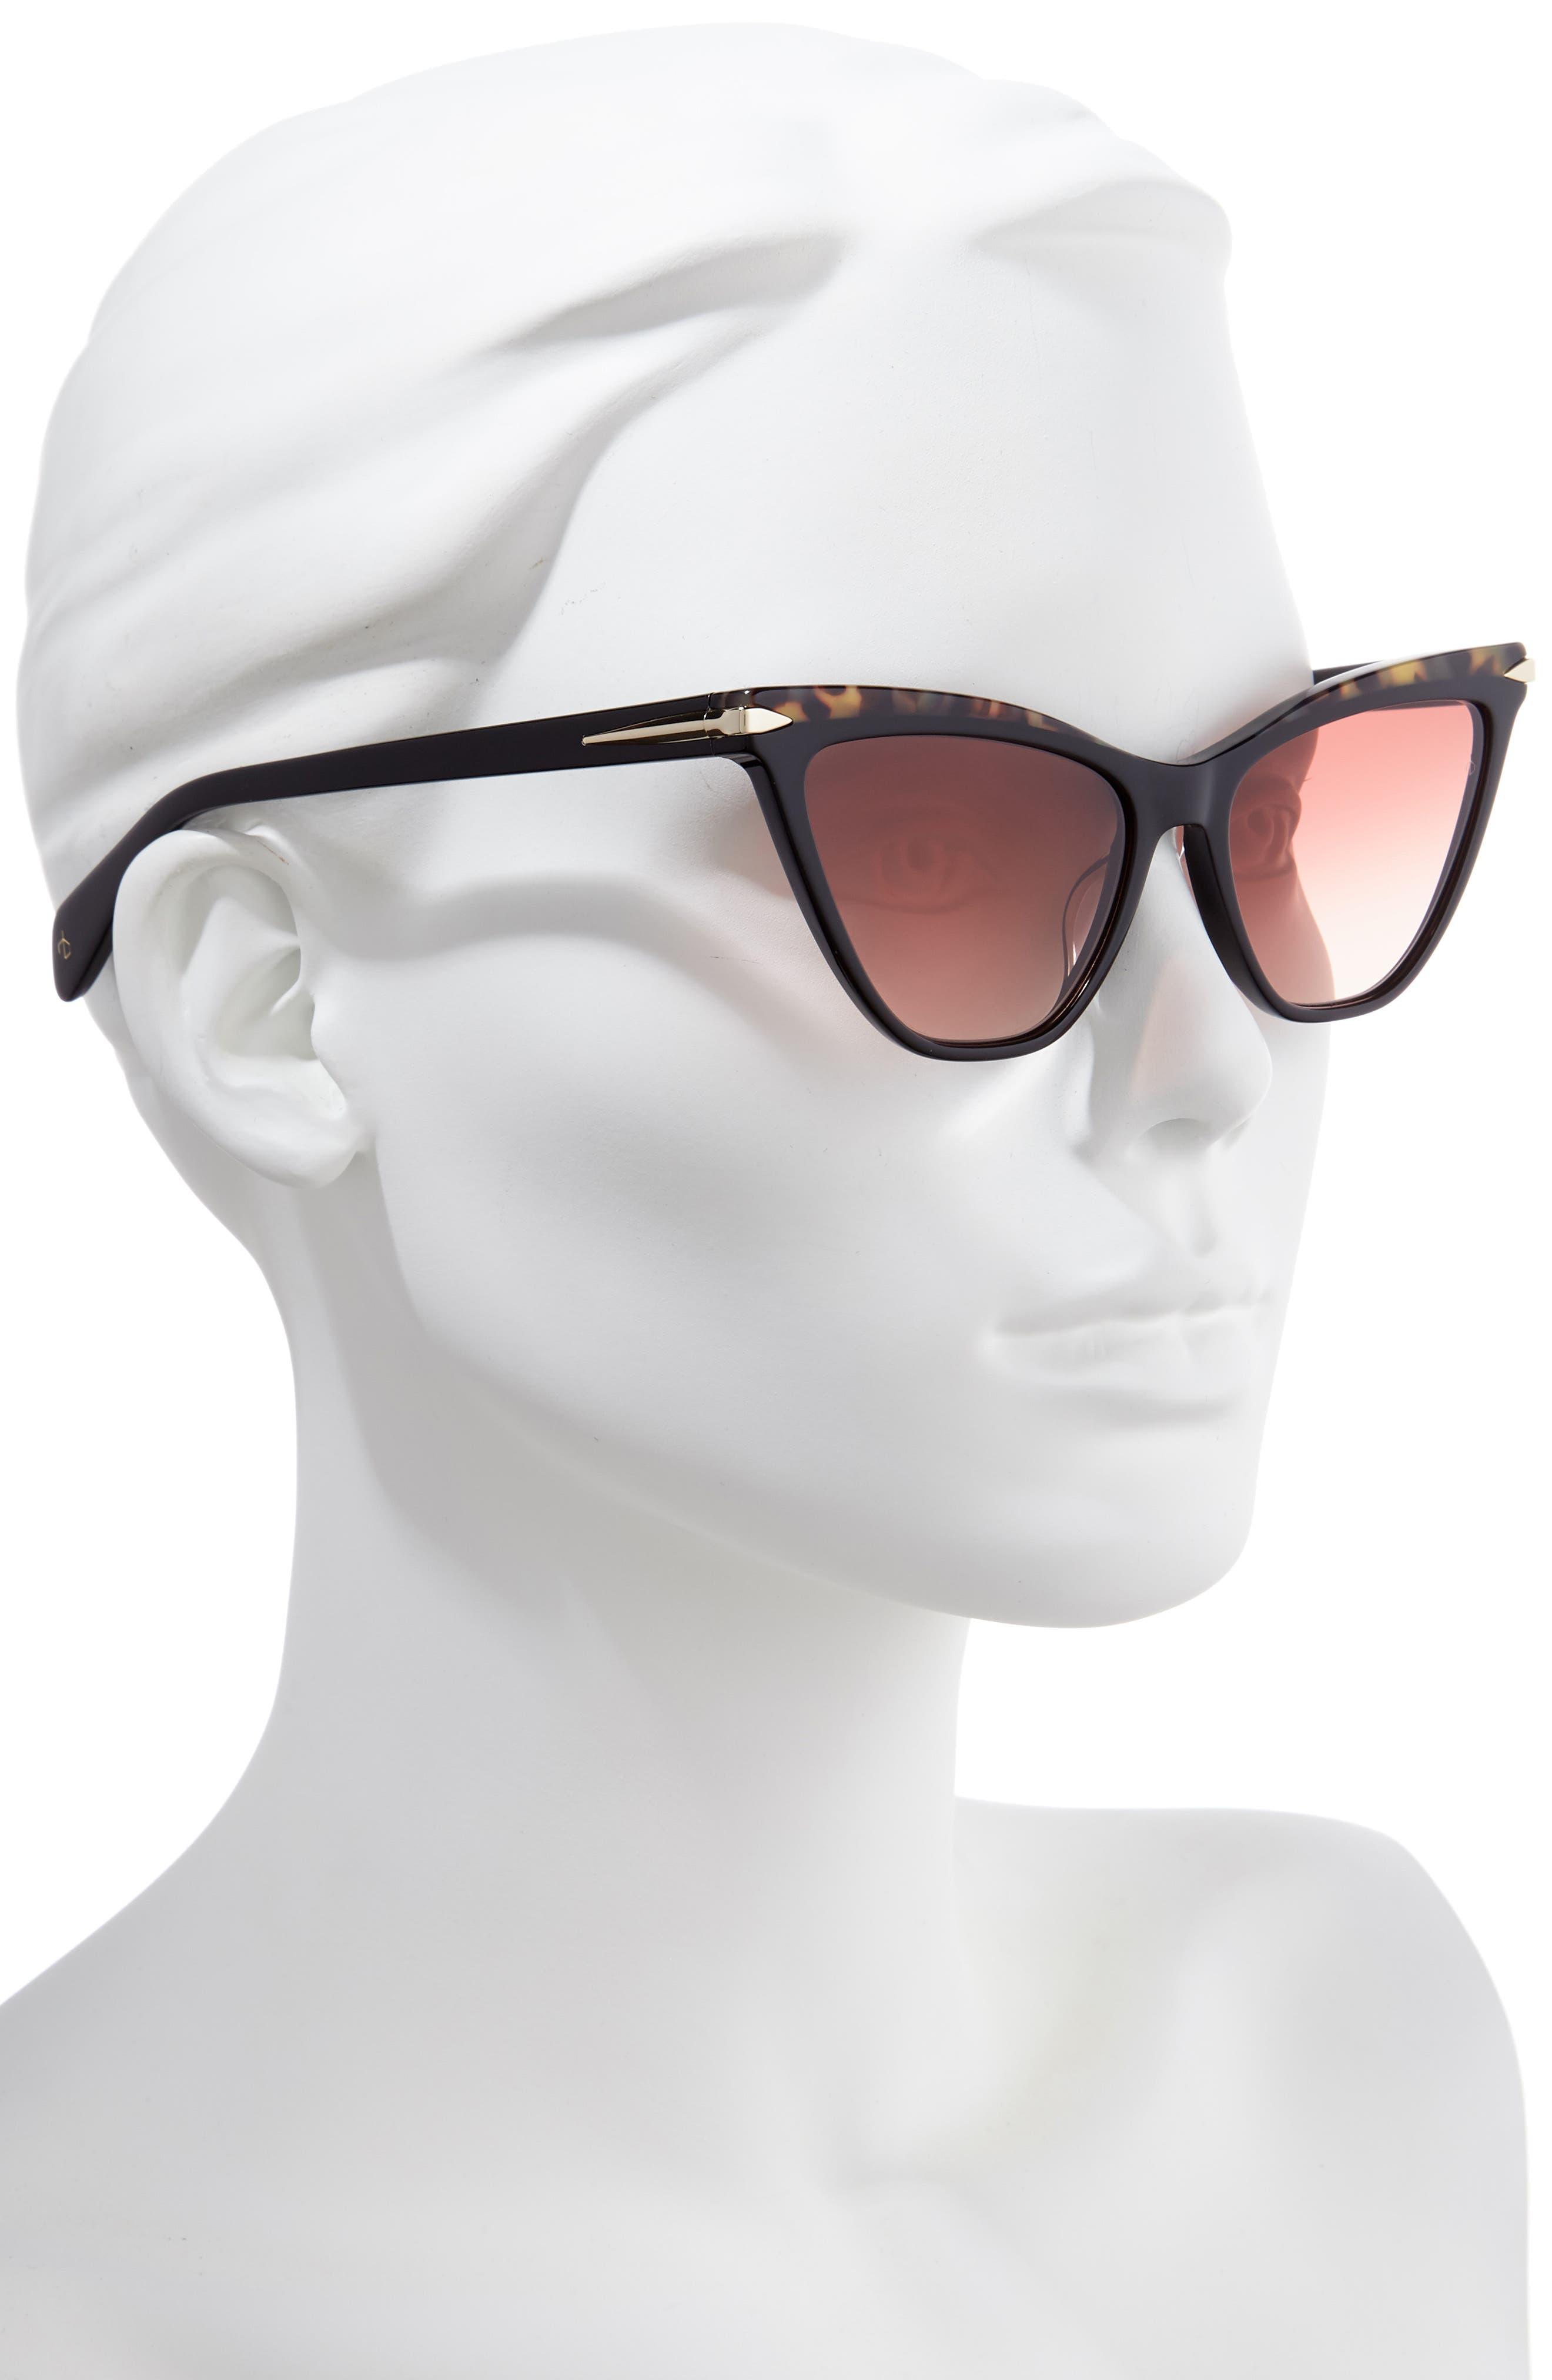 55mm Cat Eye Sunglasses,                             Alternate thumbnail 2, color,                             BLACK